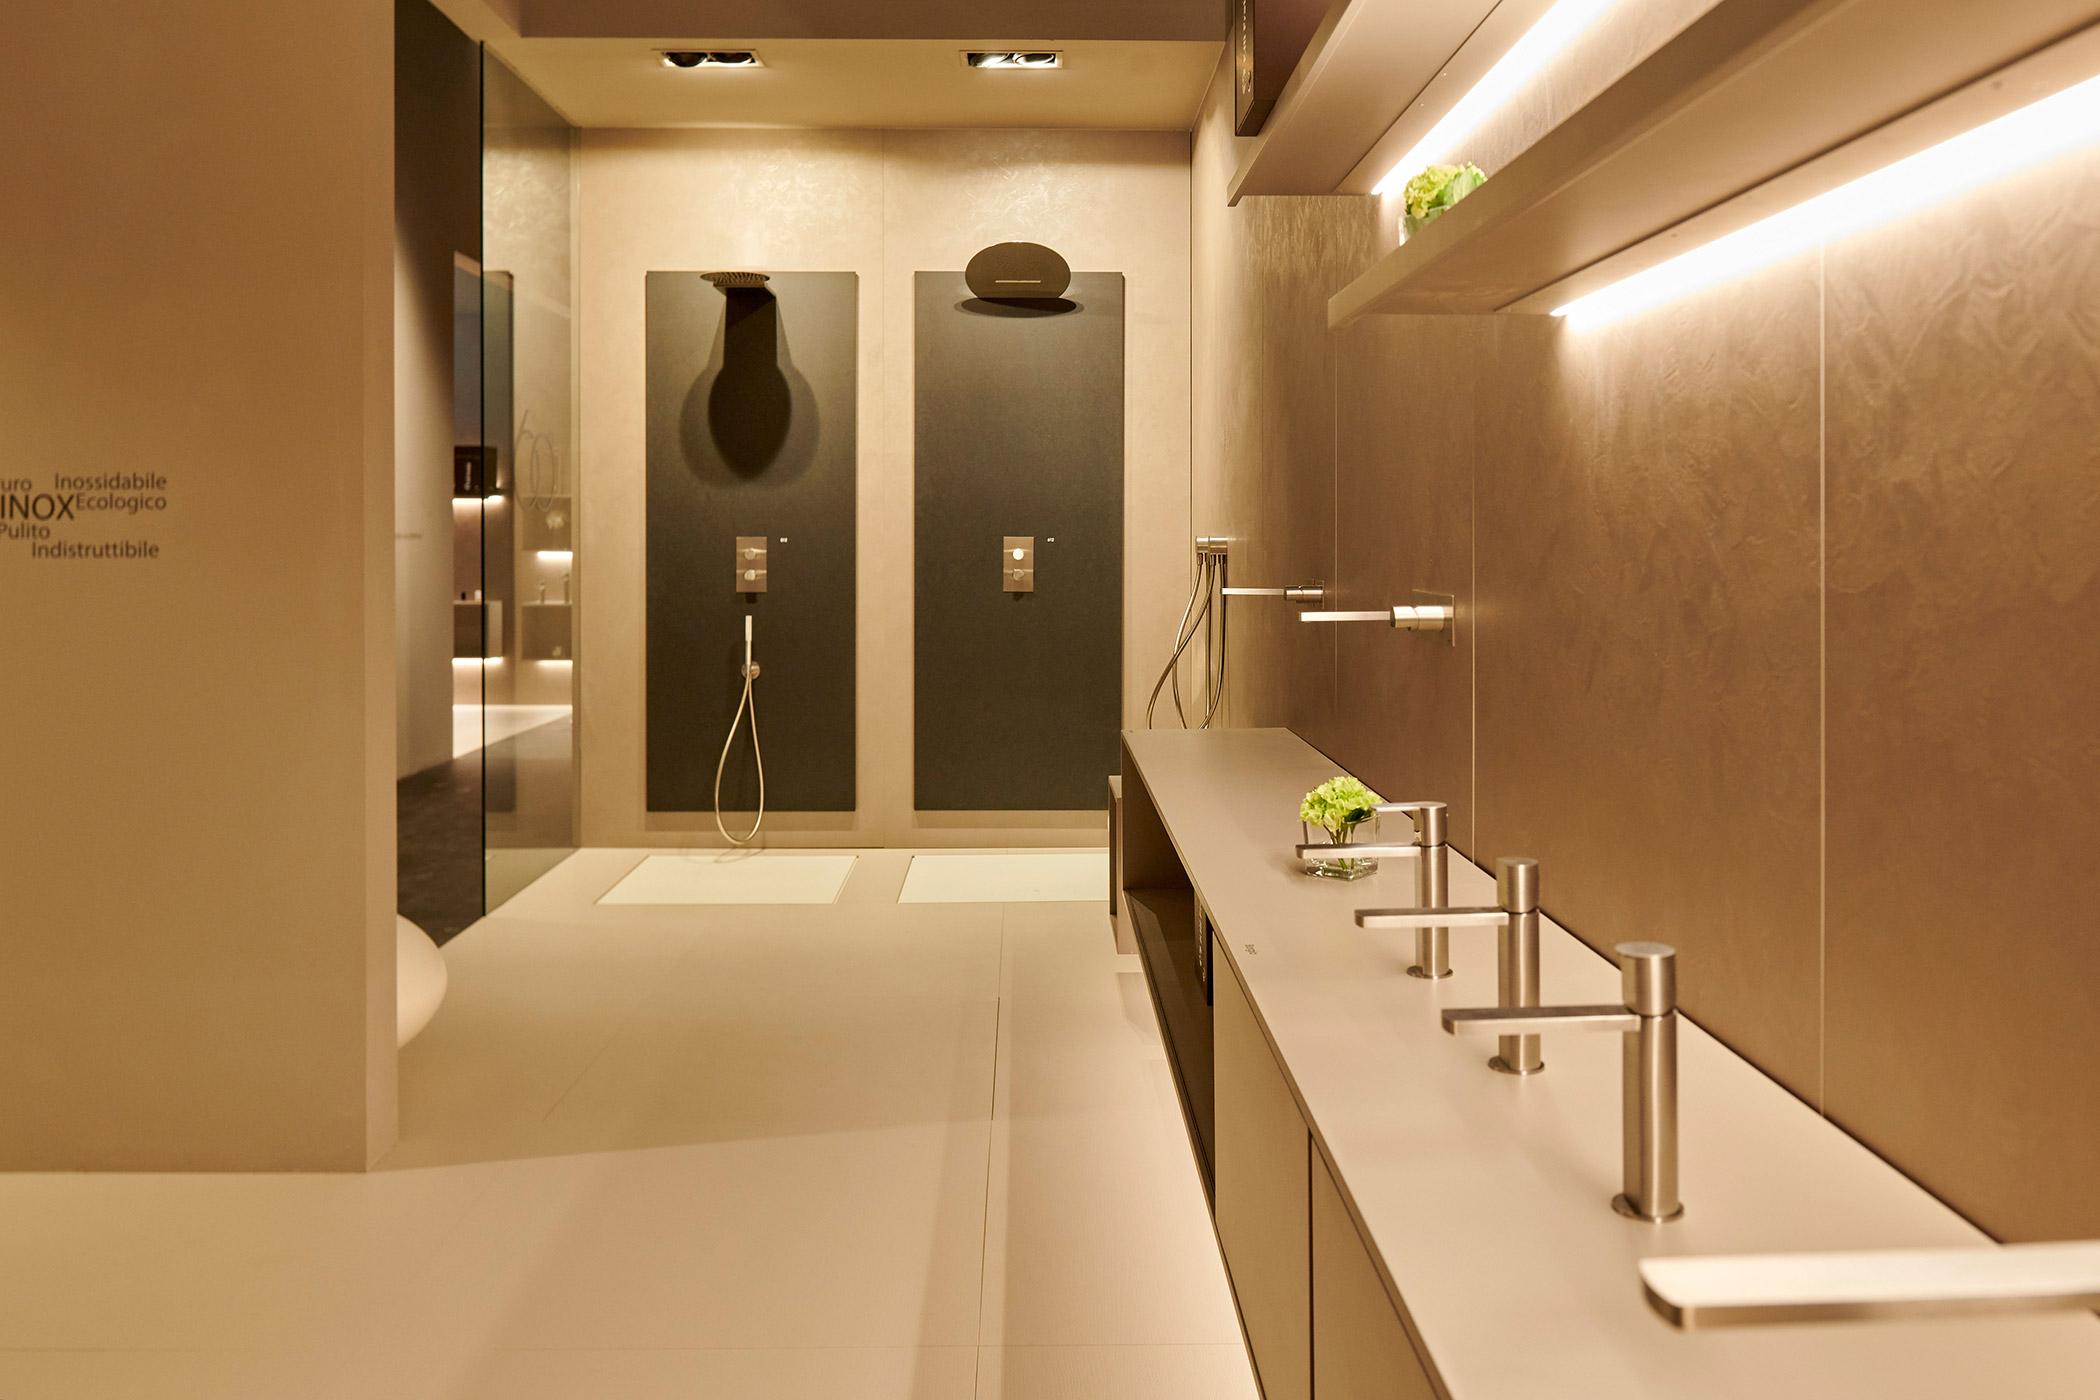 5-stand-rubinetterie-f.lli-frattini-salone-2018-interno-docci